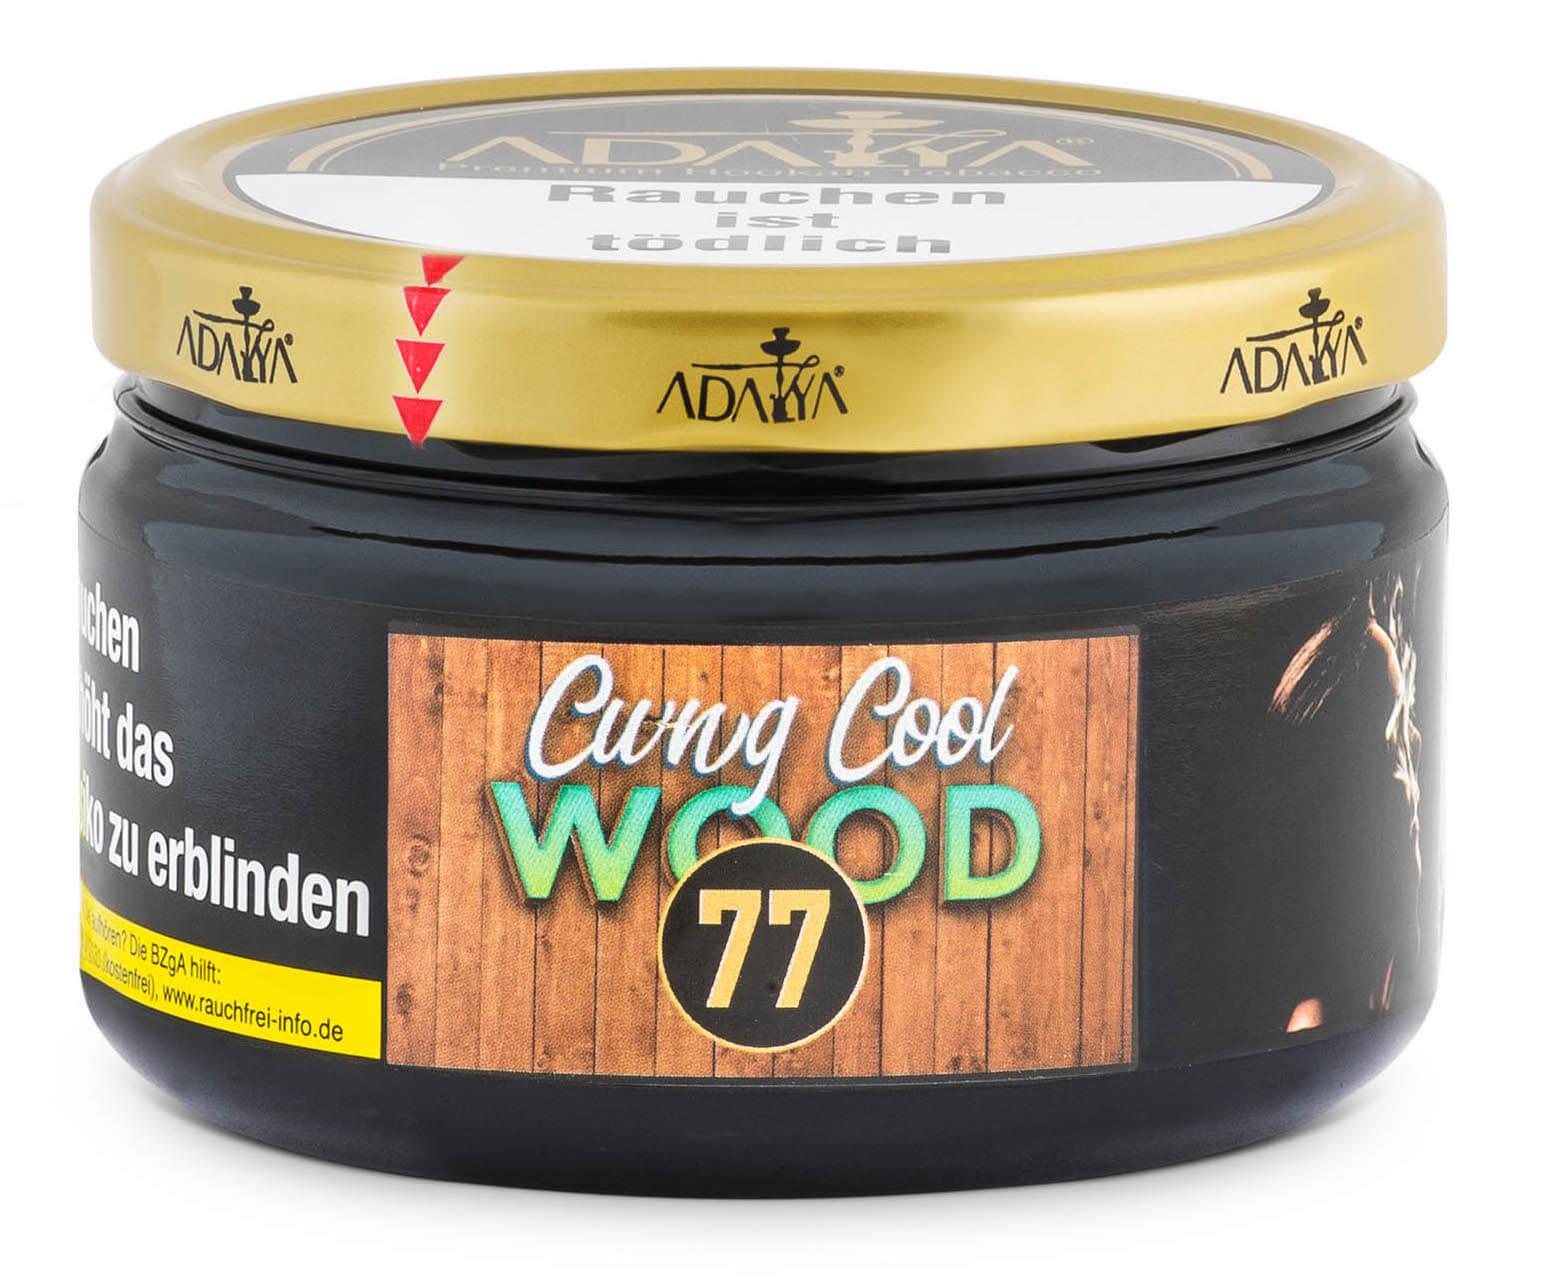 Adalya Tabak Cwng Cool Wood #77 200g